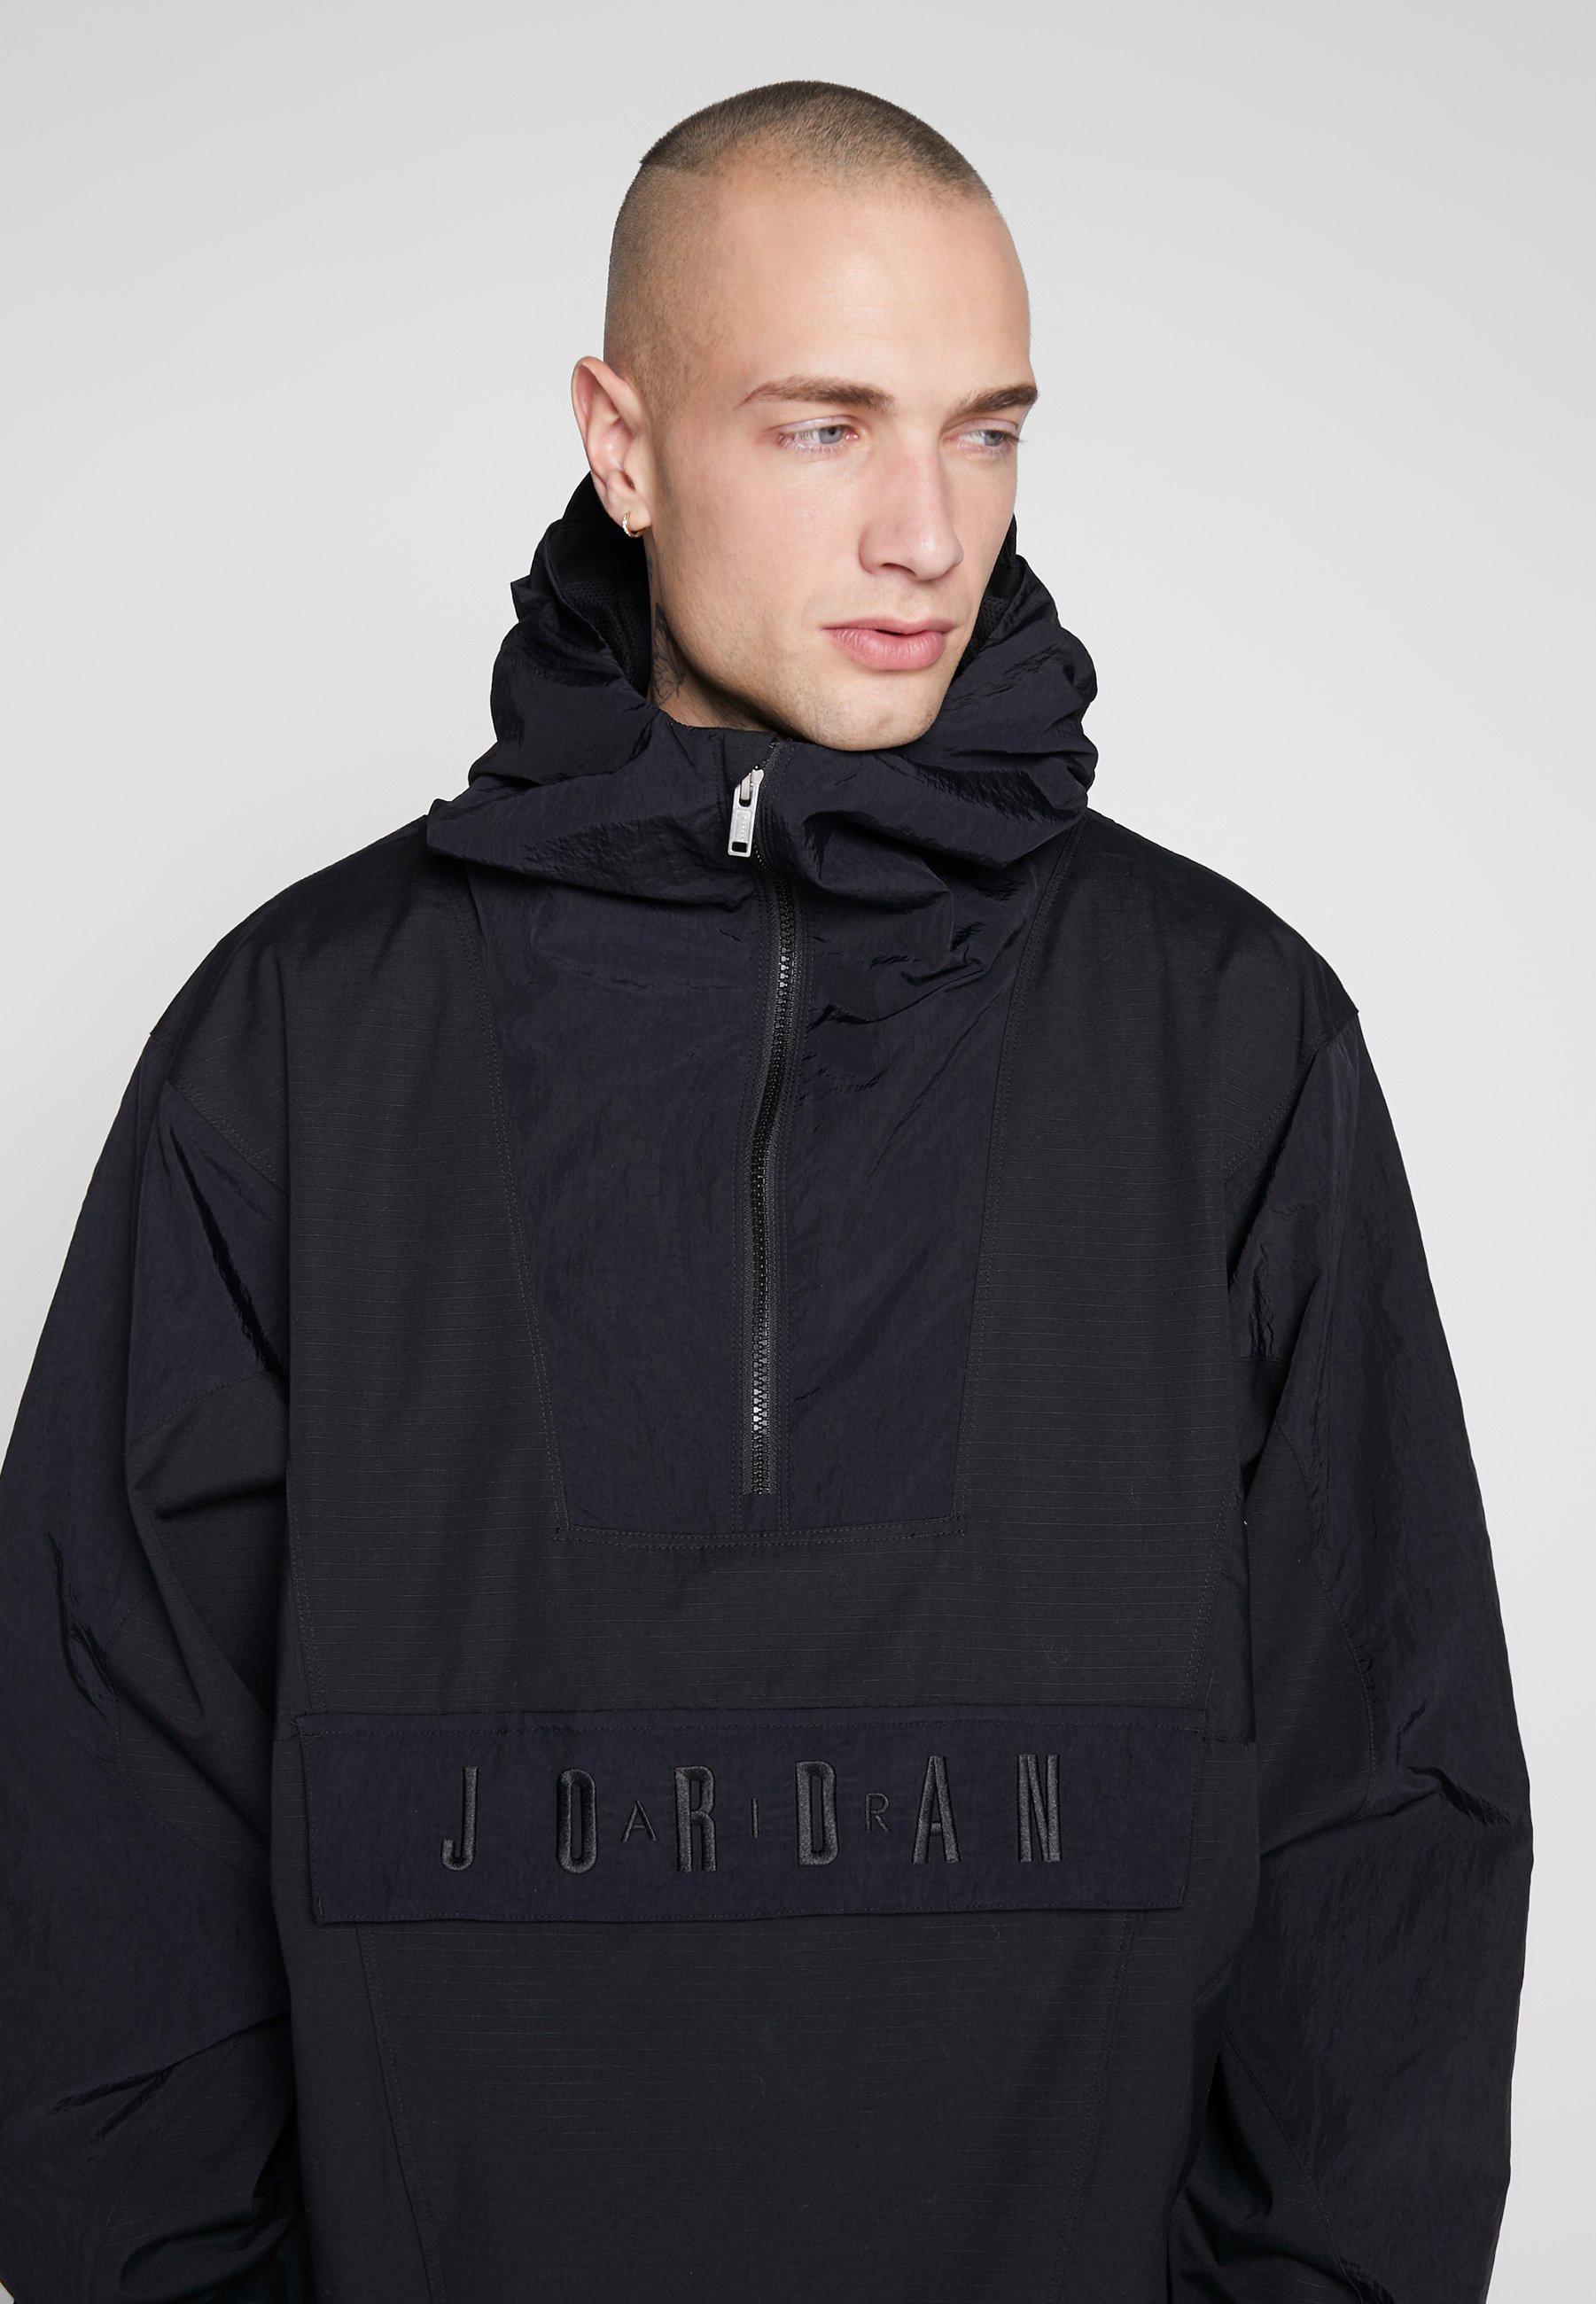 Jordan Tunn Jacka - Black